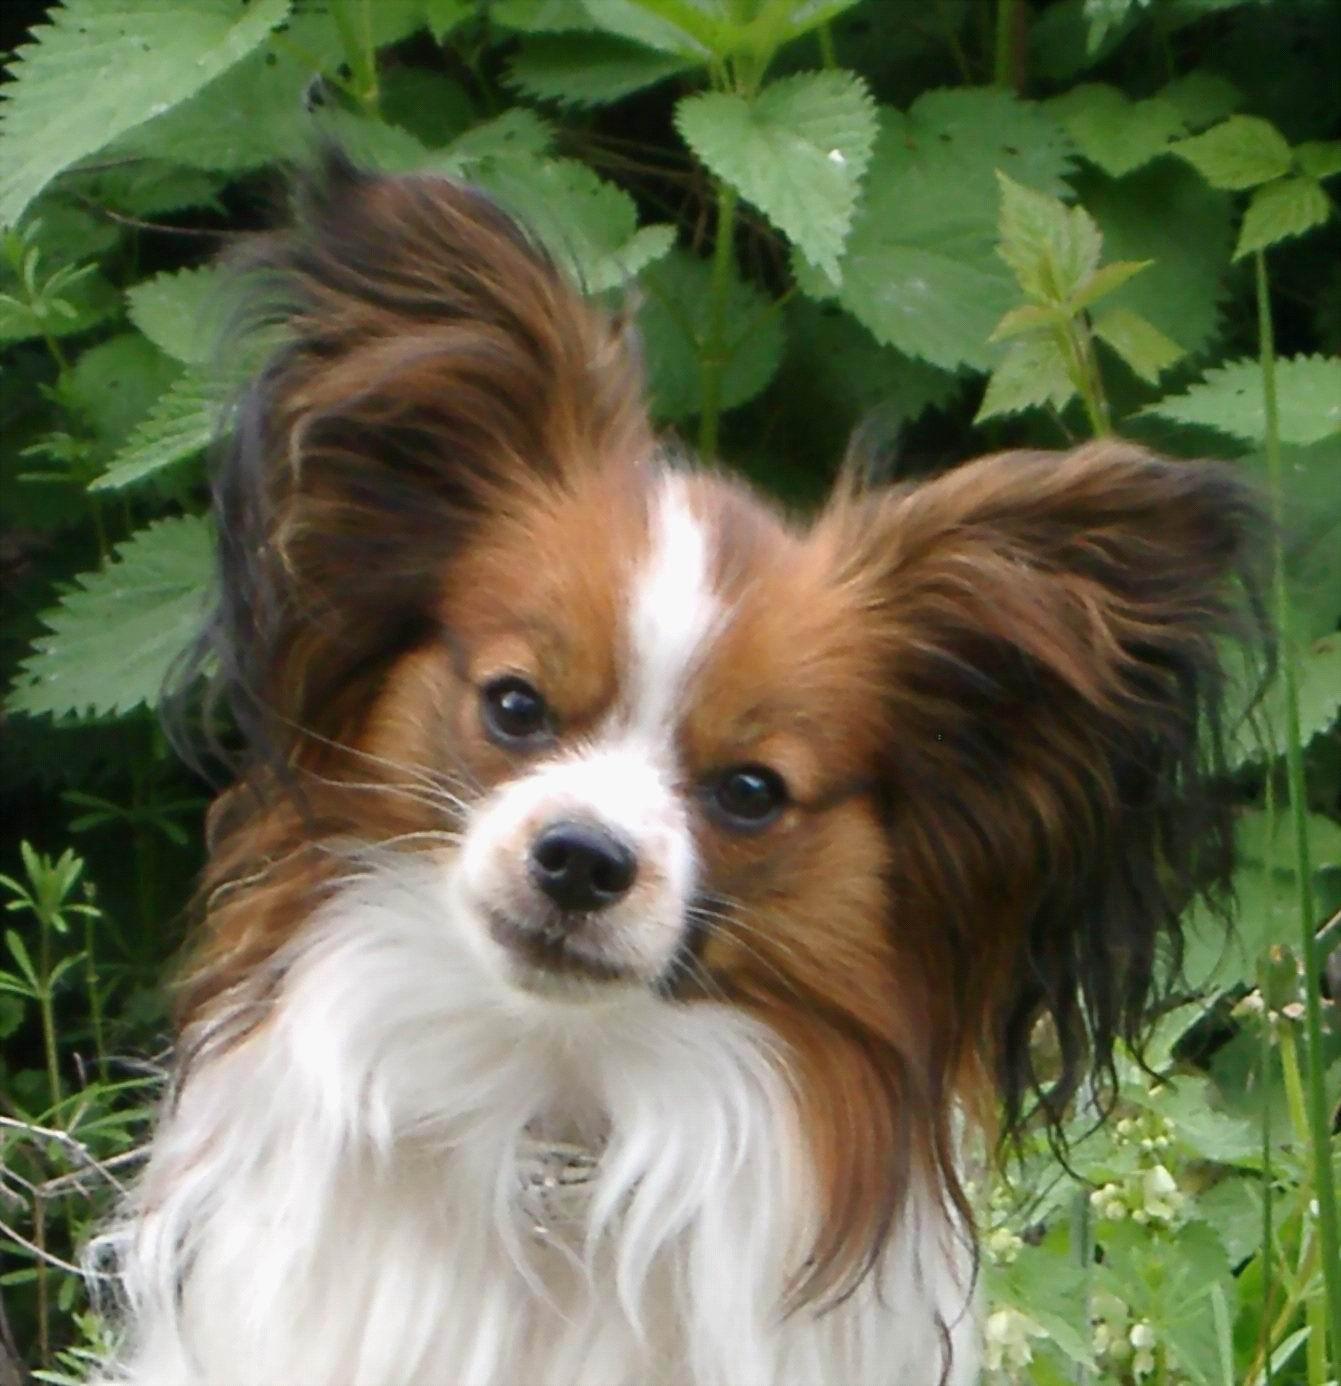 Cute Phalène dog face wallpaper